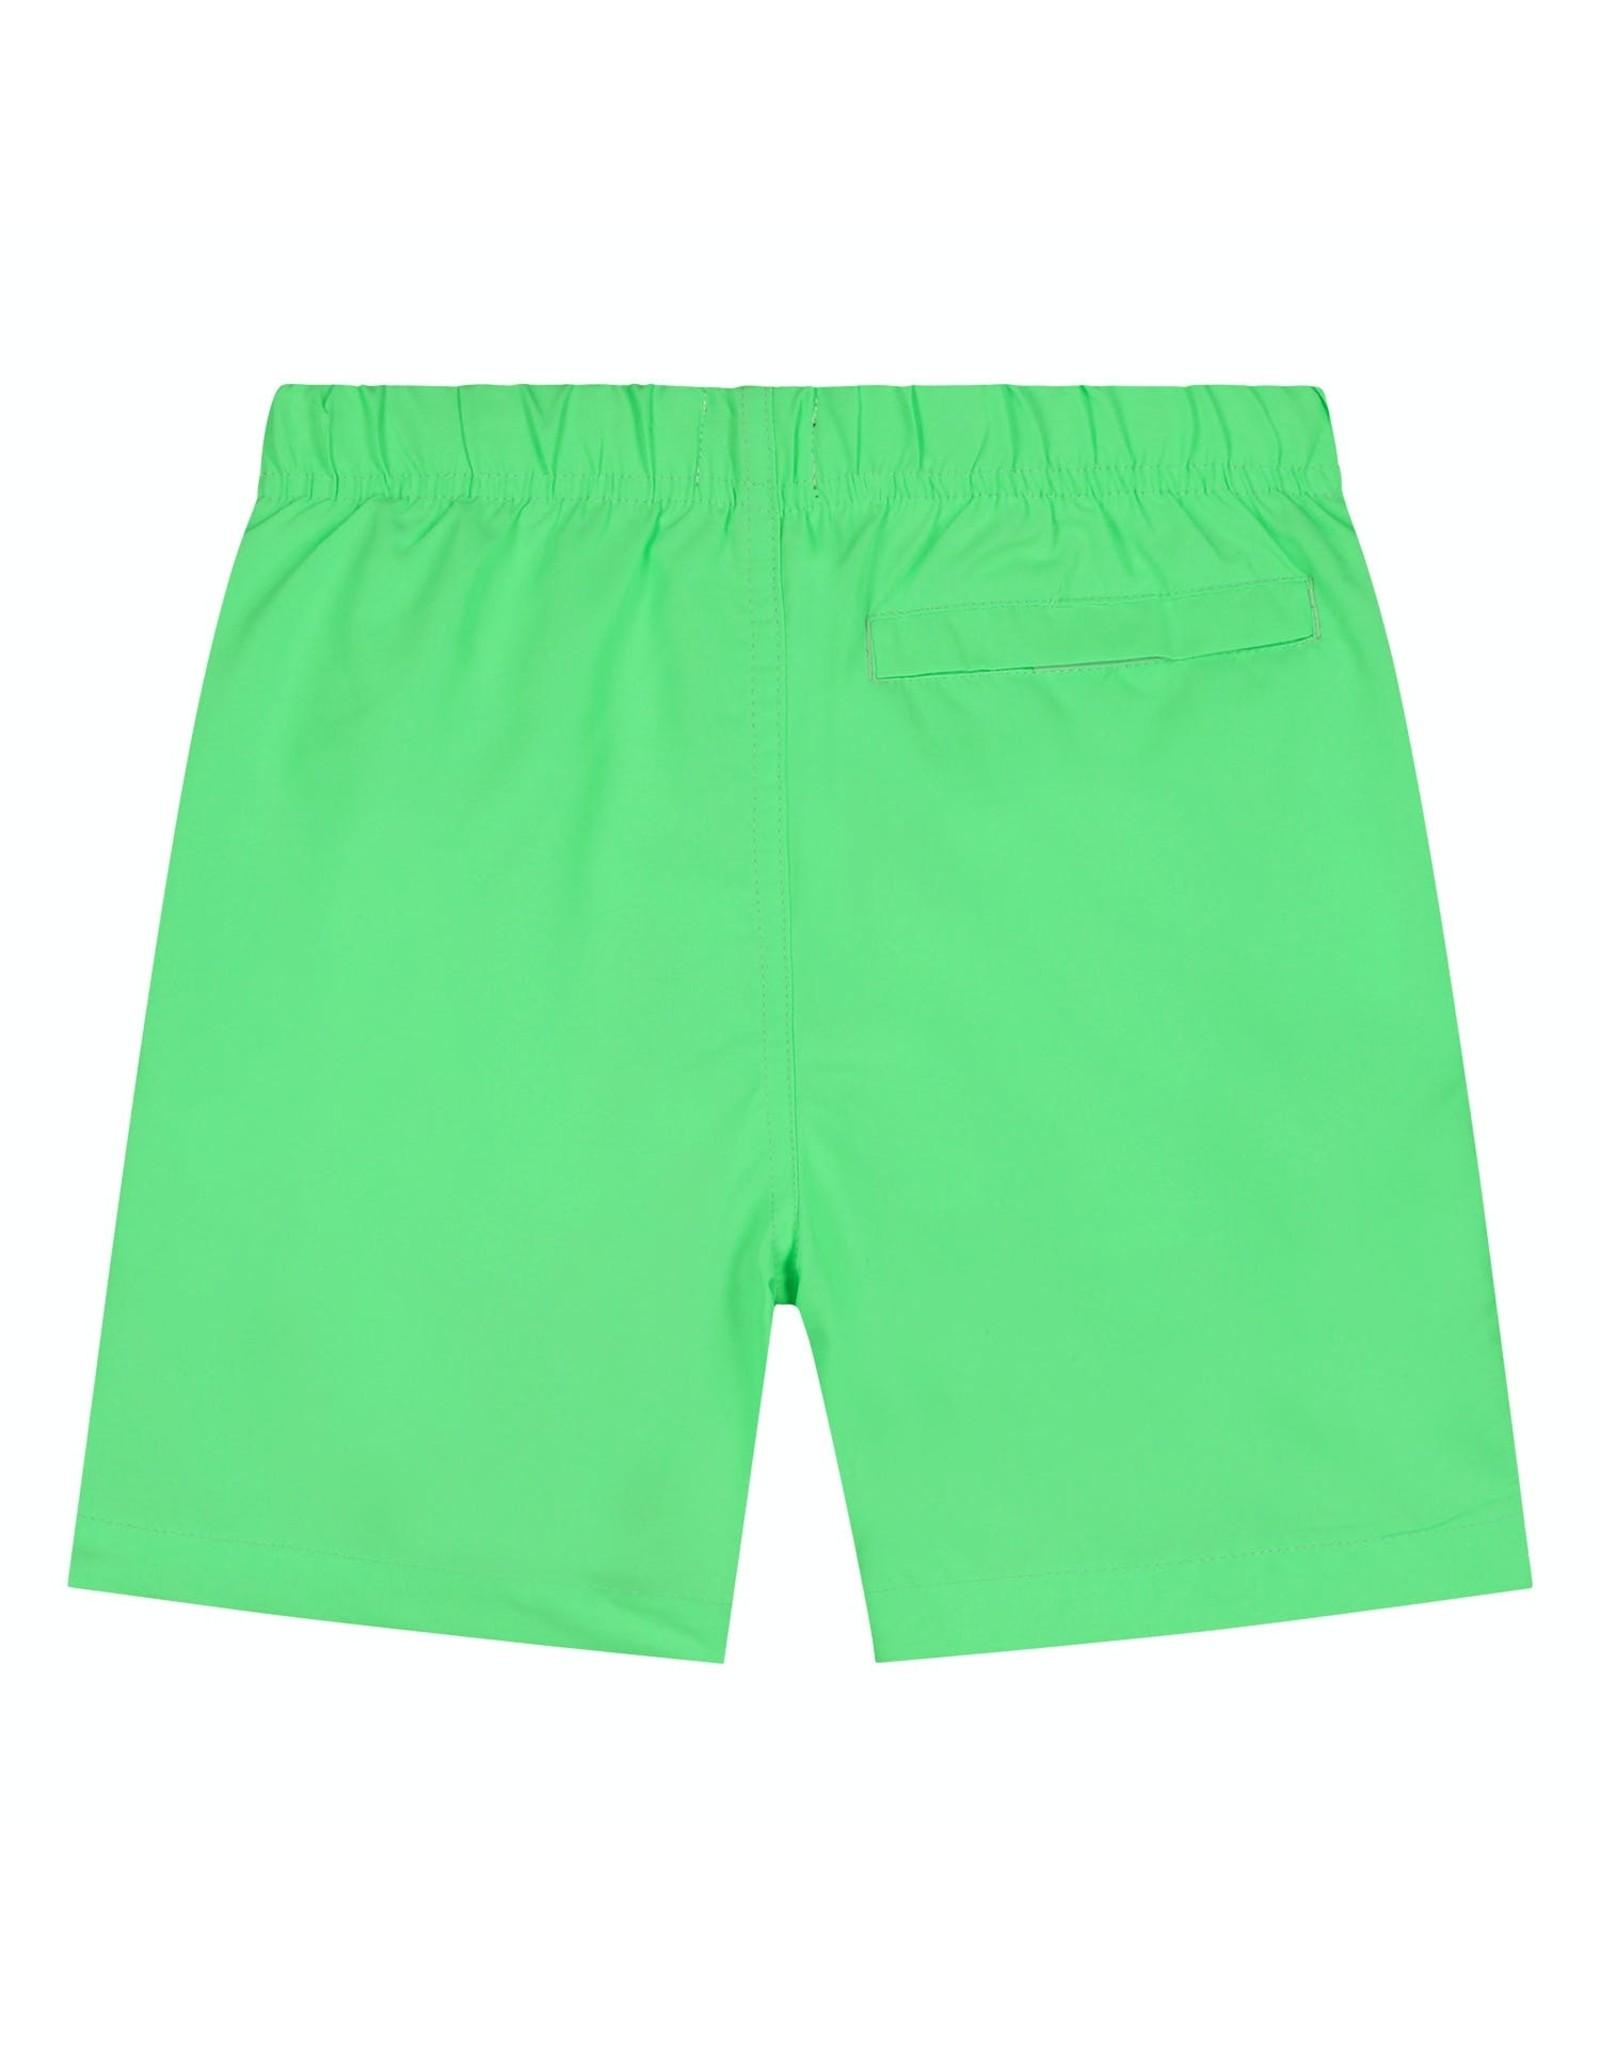 Shiwi 4100112000 Swimshort